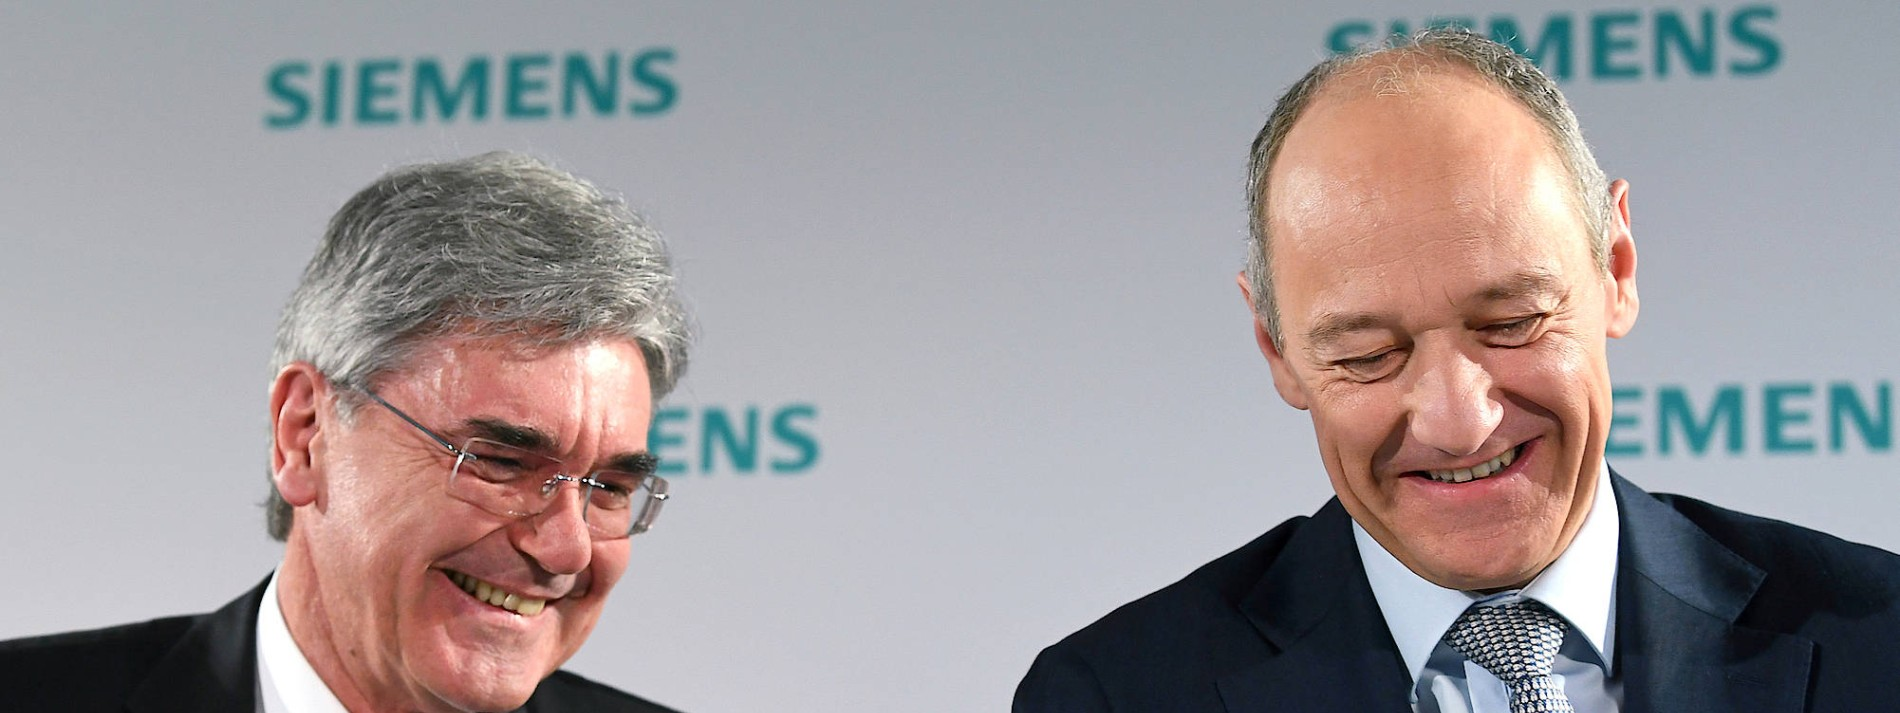 Siemens kommt gut durchs Corona-Quartal